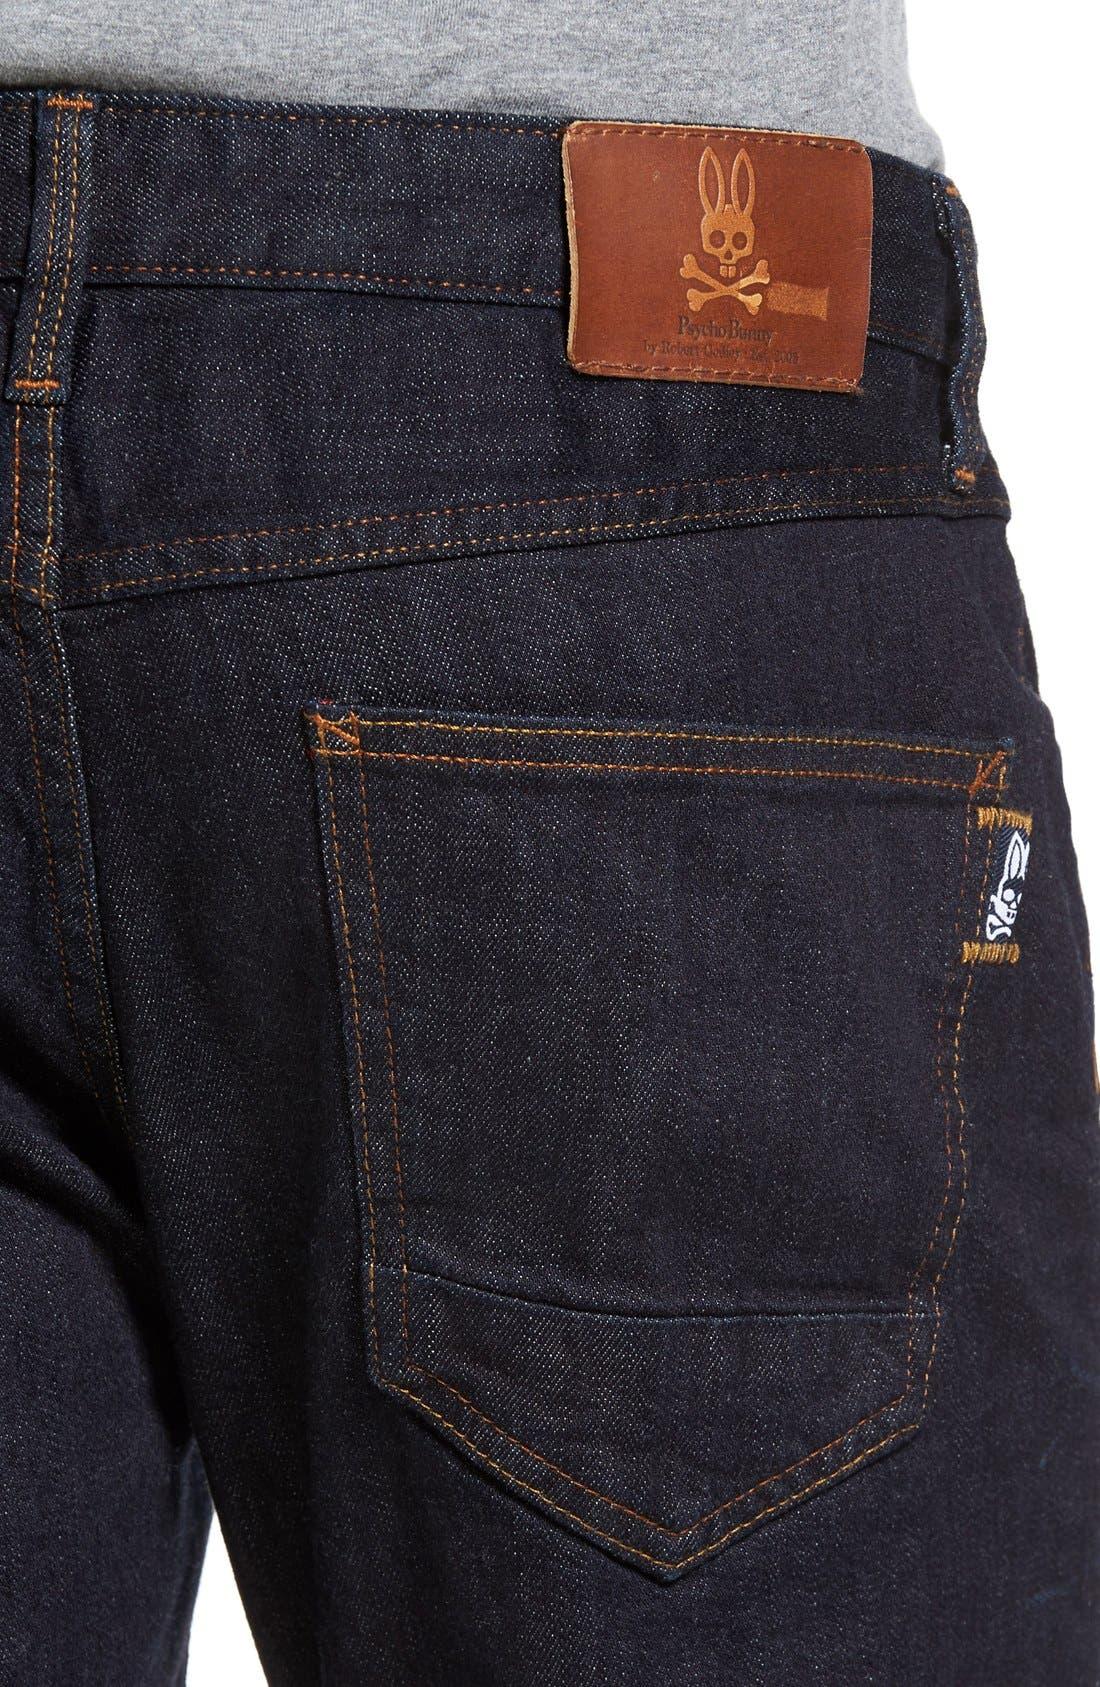 Canal Slim Fit Jeans,                             Alternate thumbnail 10, color,                             460